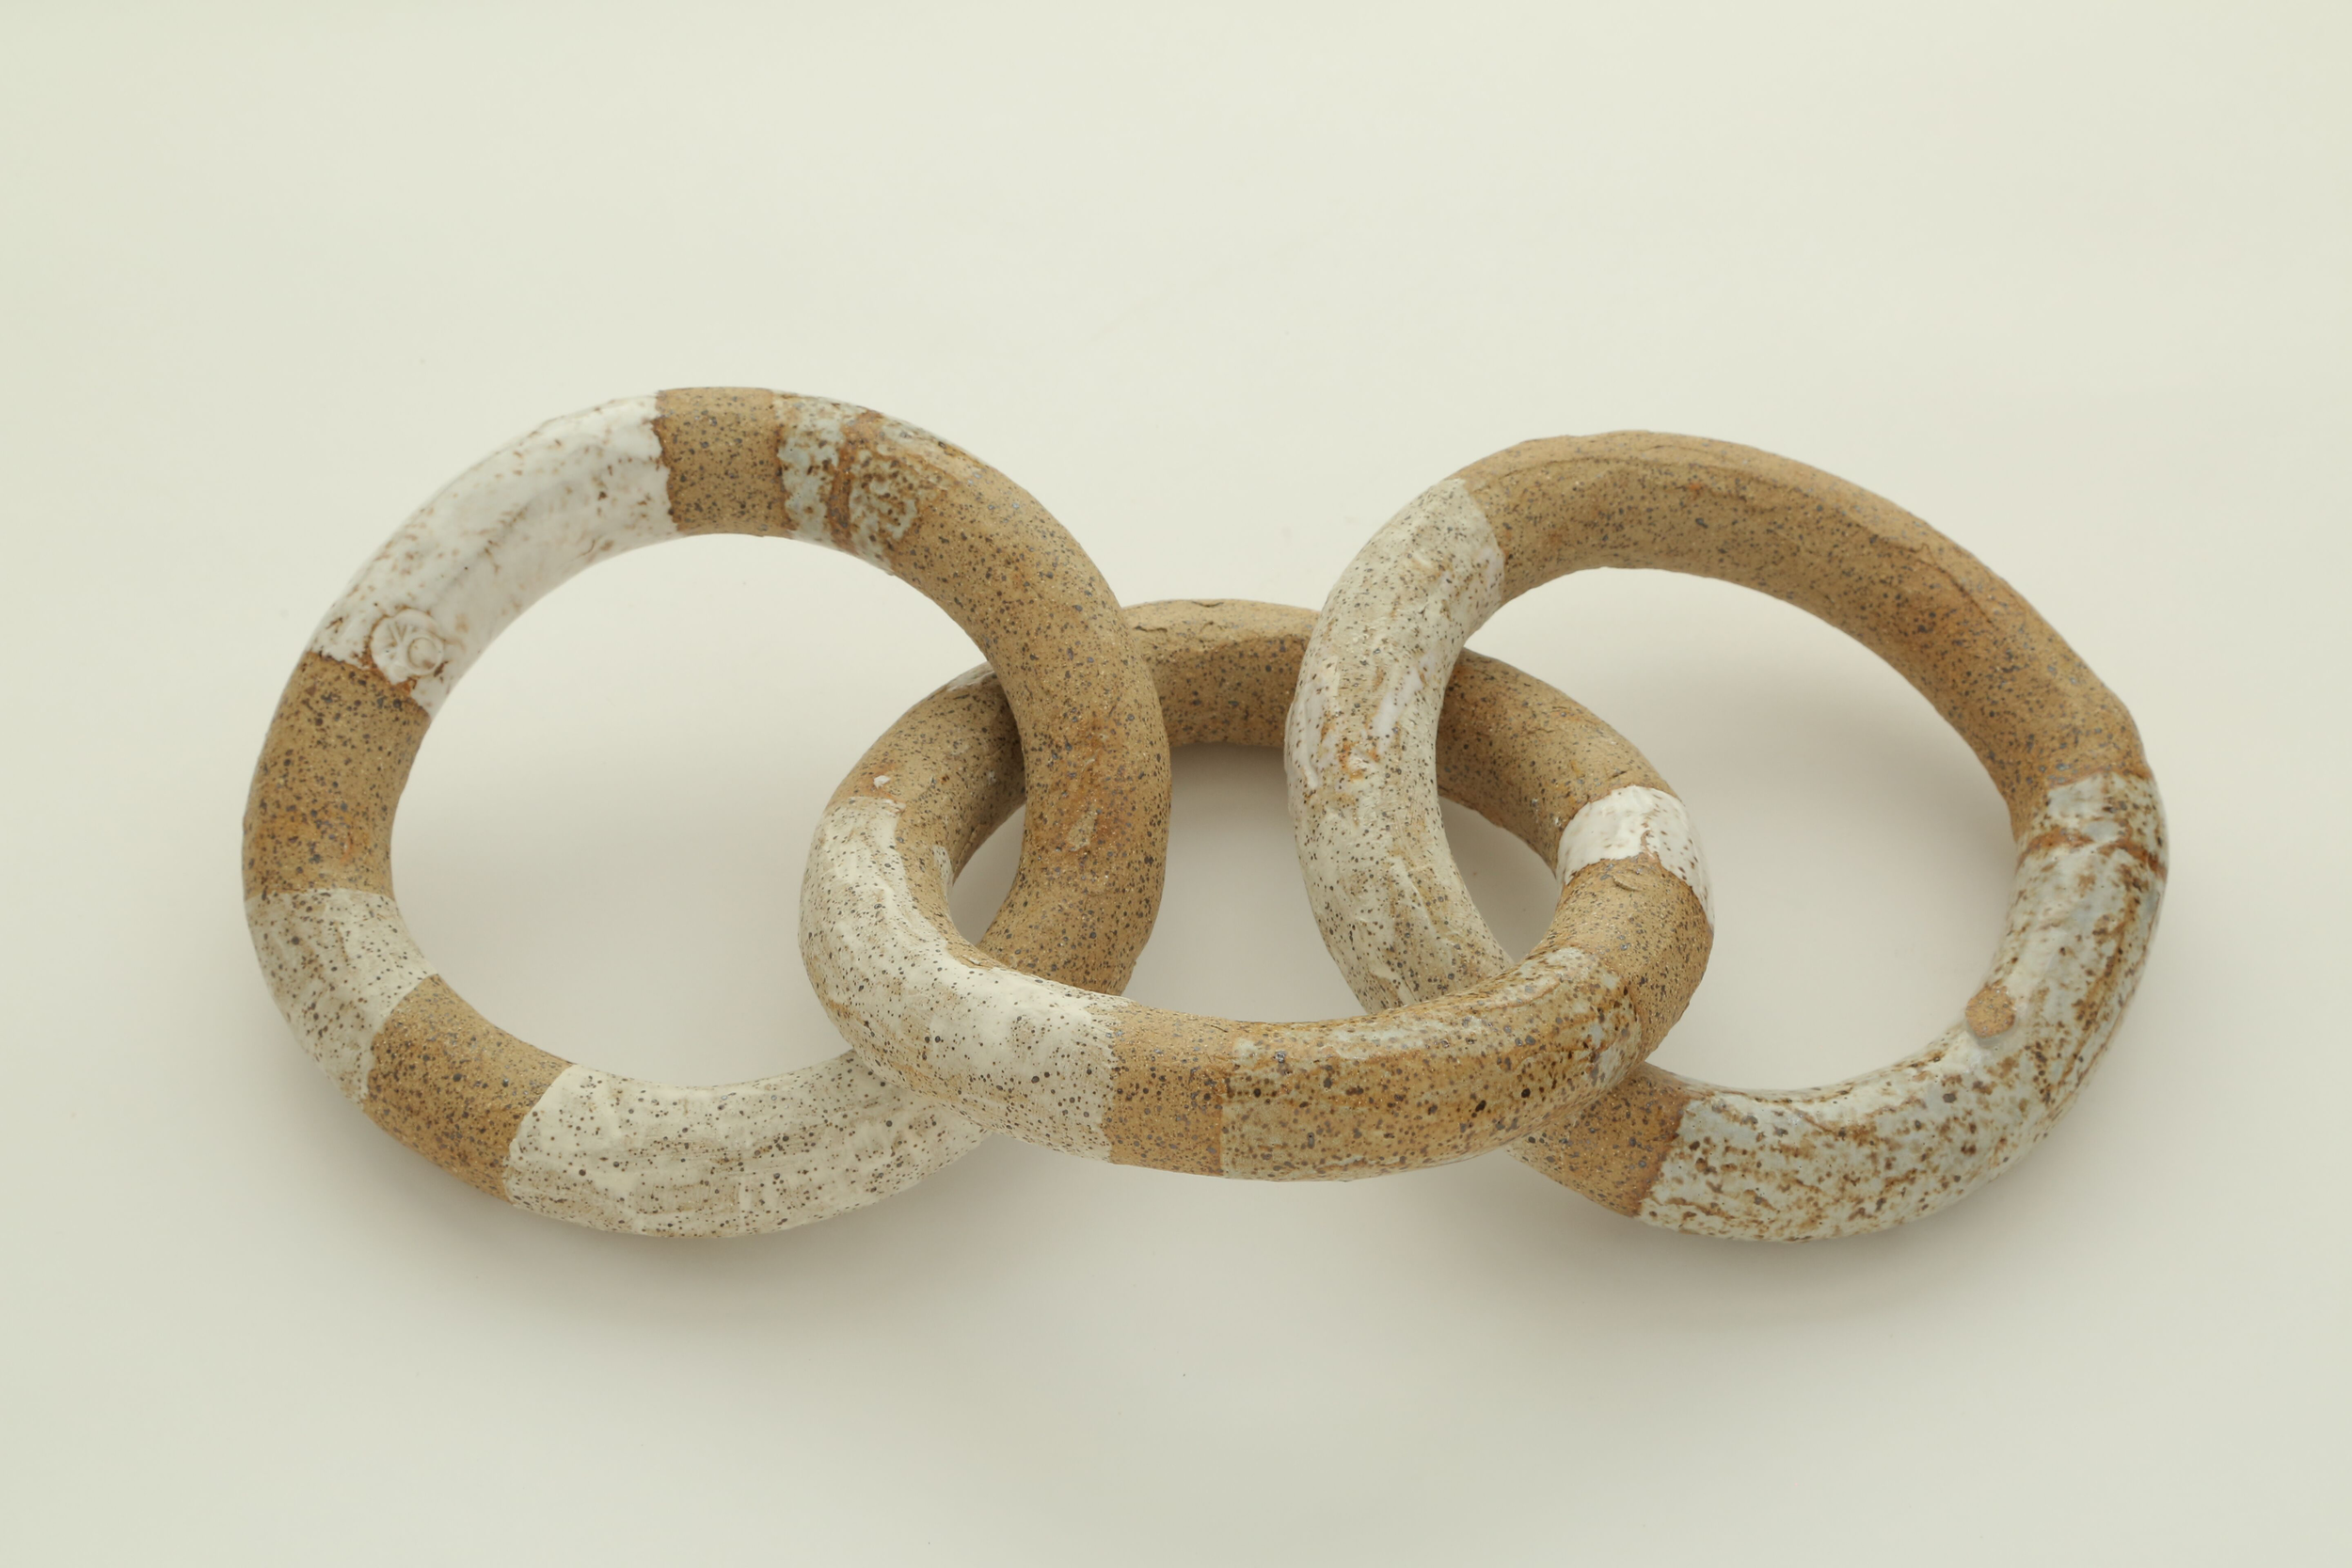 Ceramic Chain (3 Links)